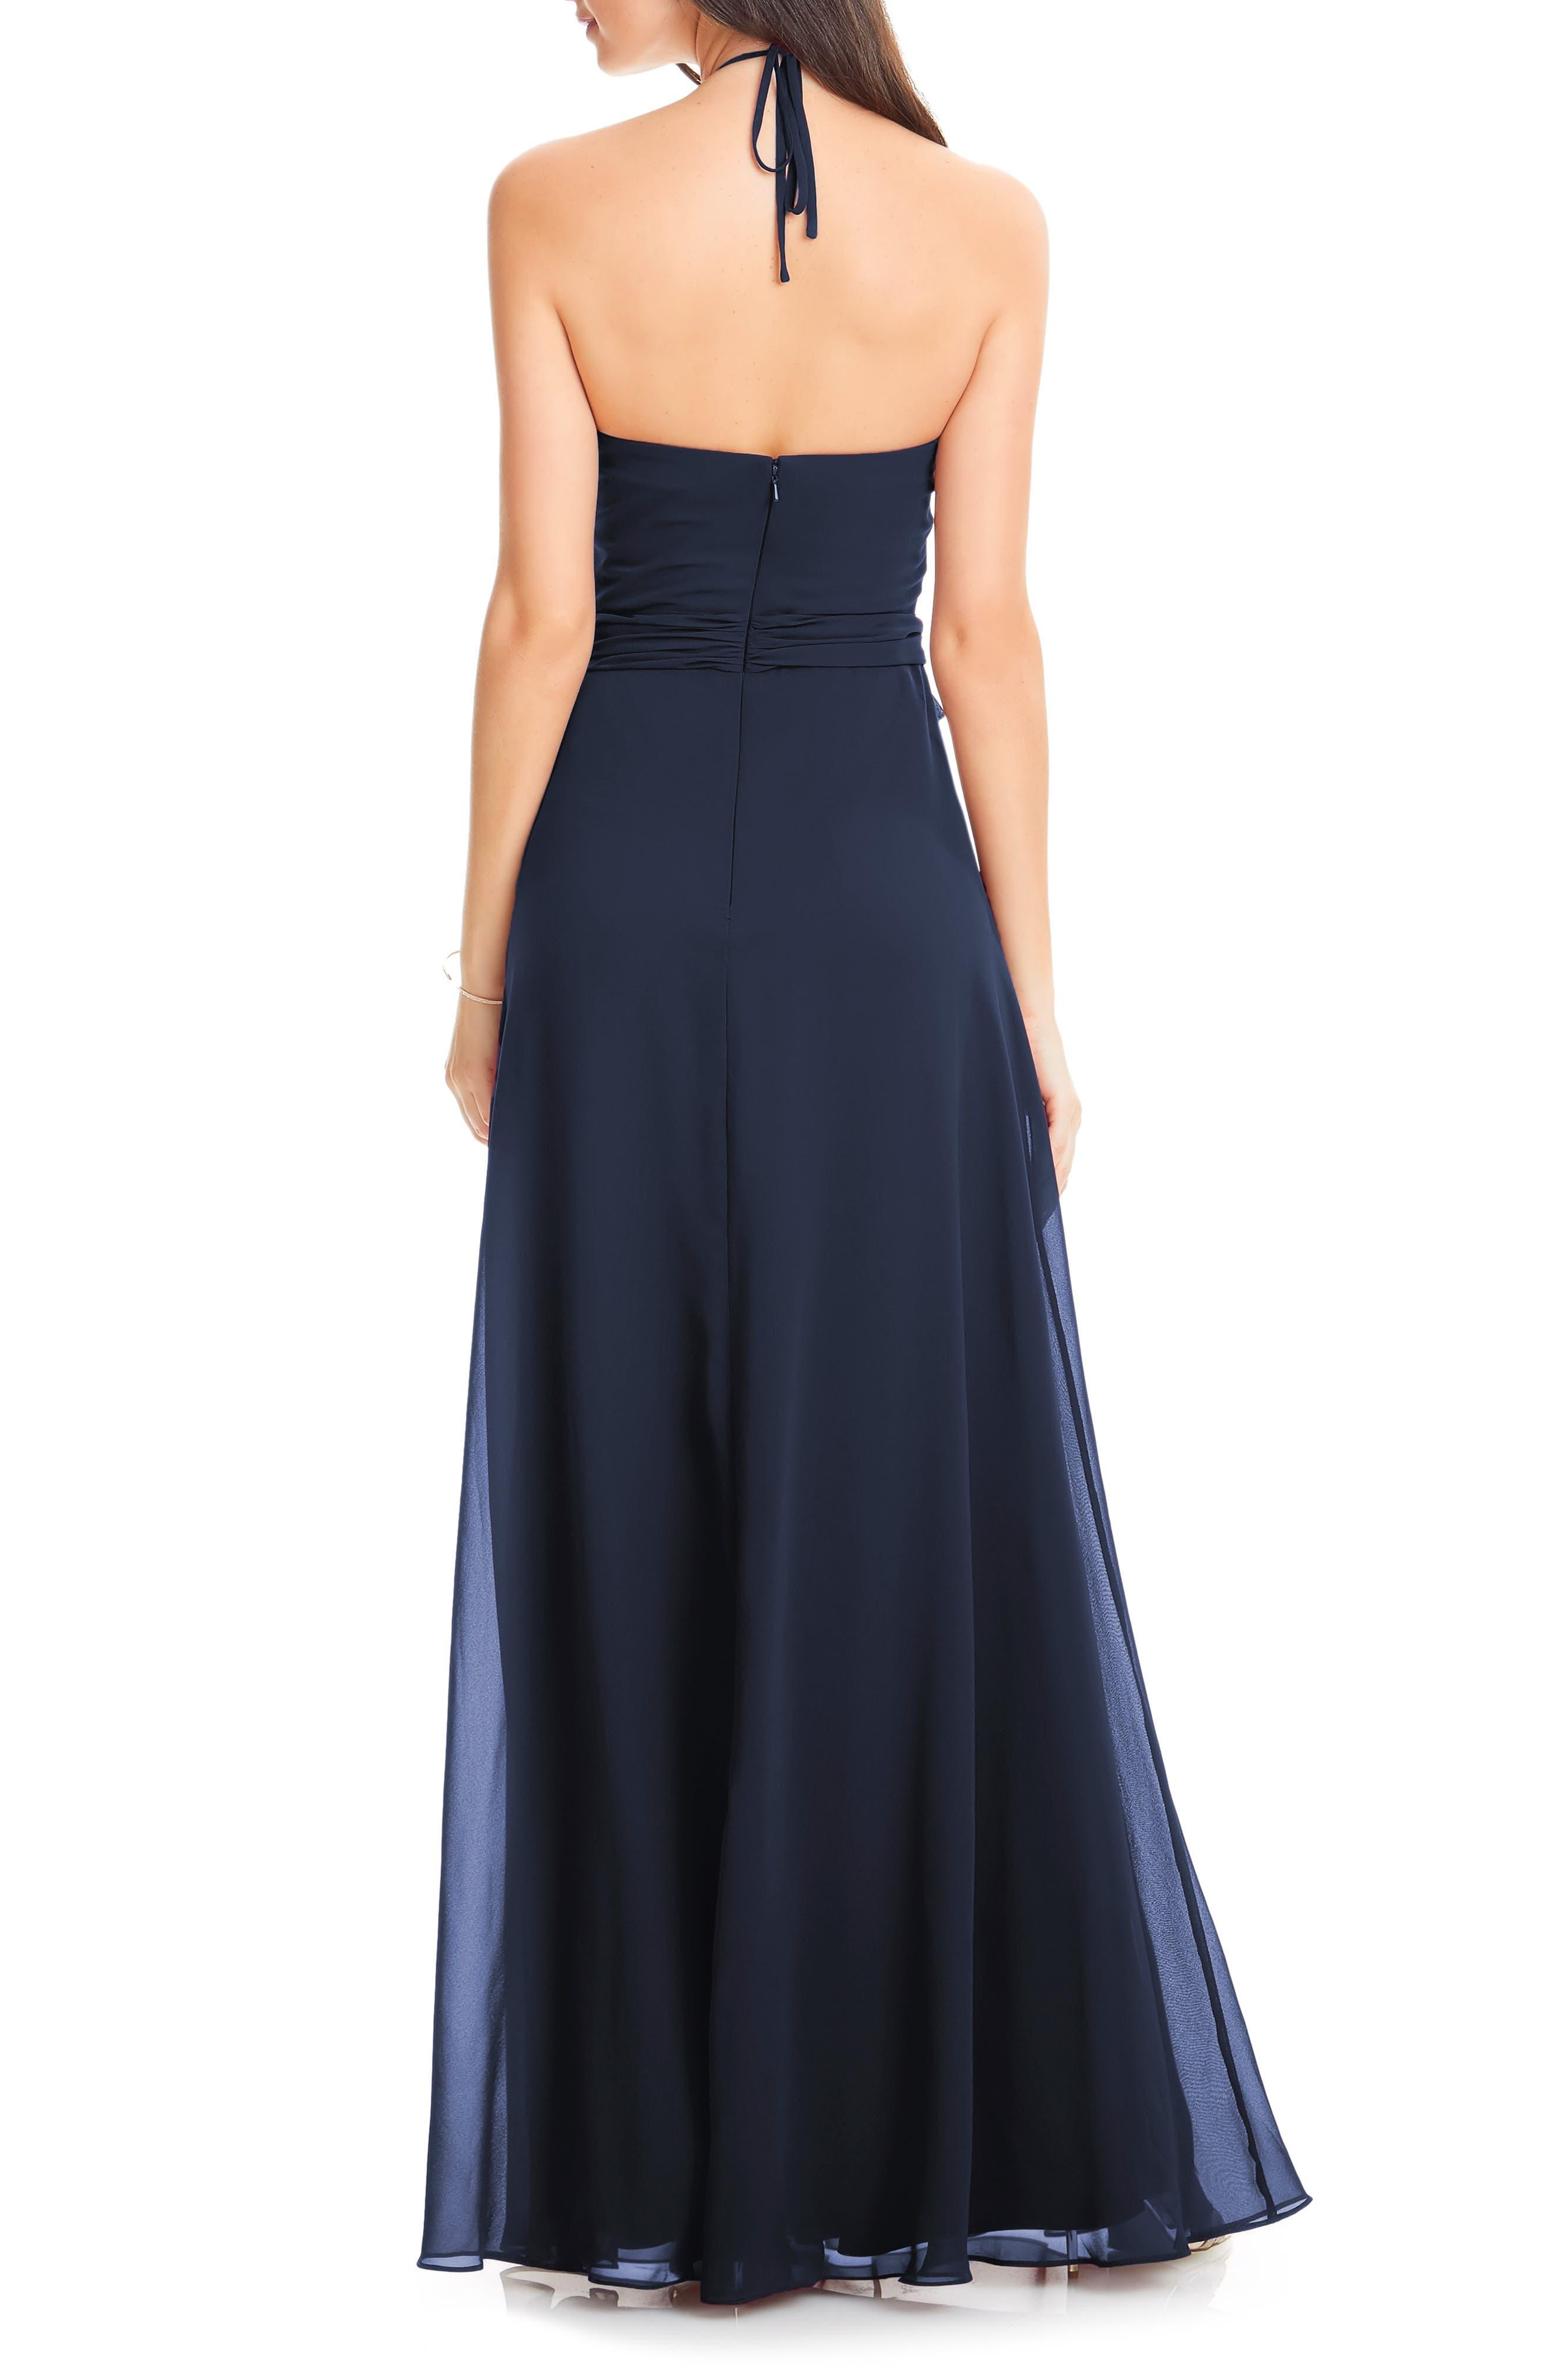 #LEVKOFF, Chiffon Tie Waist Halter Gown, Alternate thumbnail 2, color, NAVY